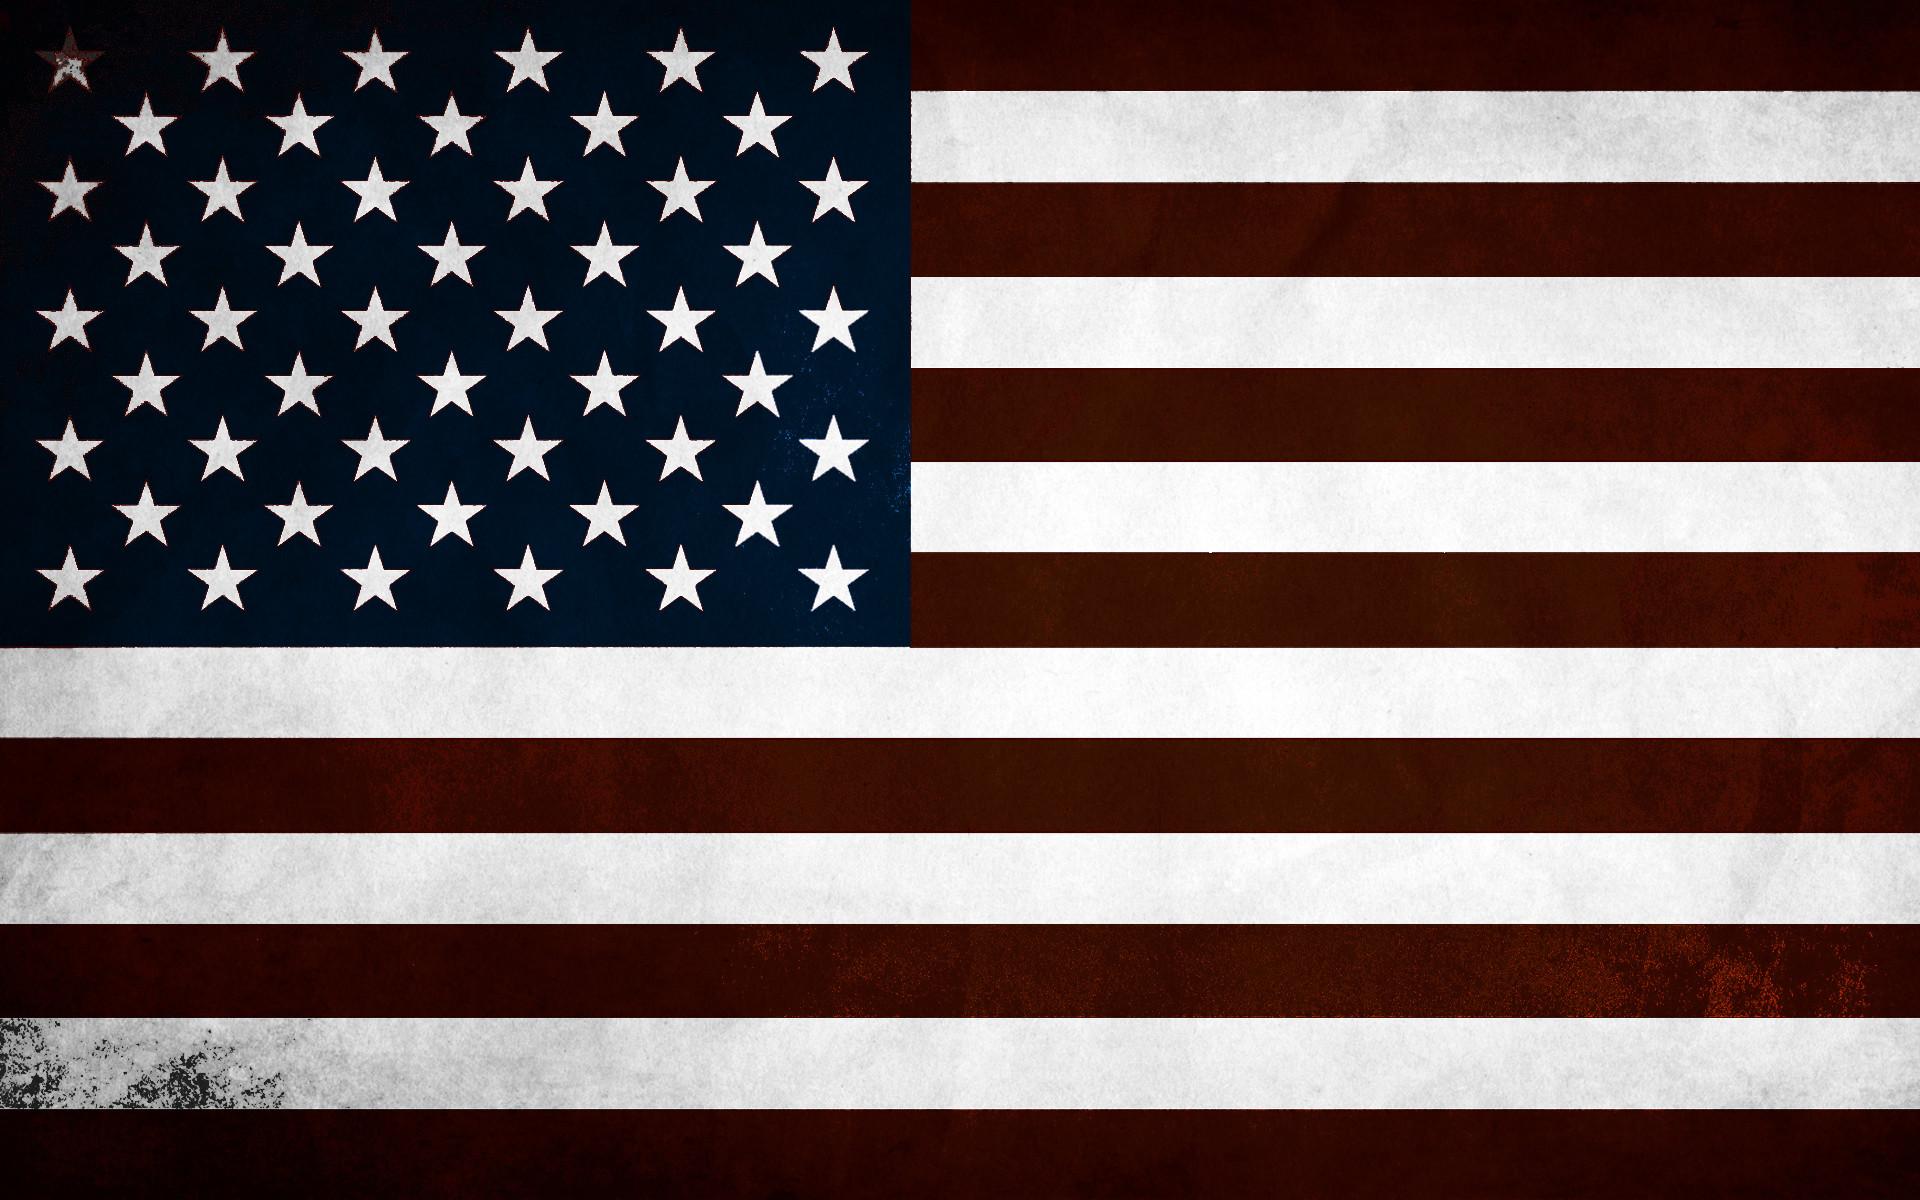 American Flag Wallpaper HD.